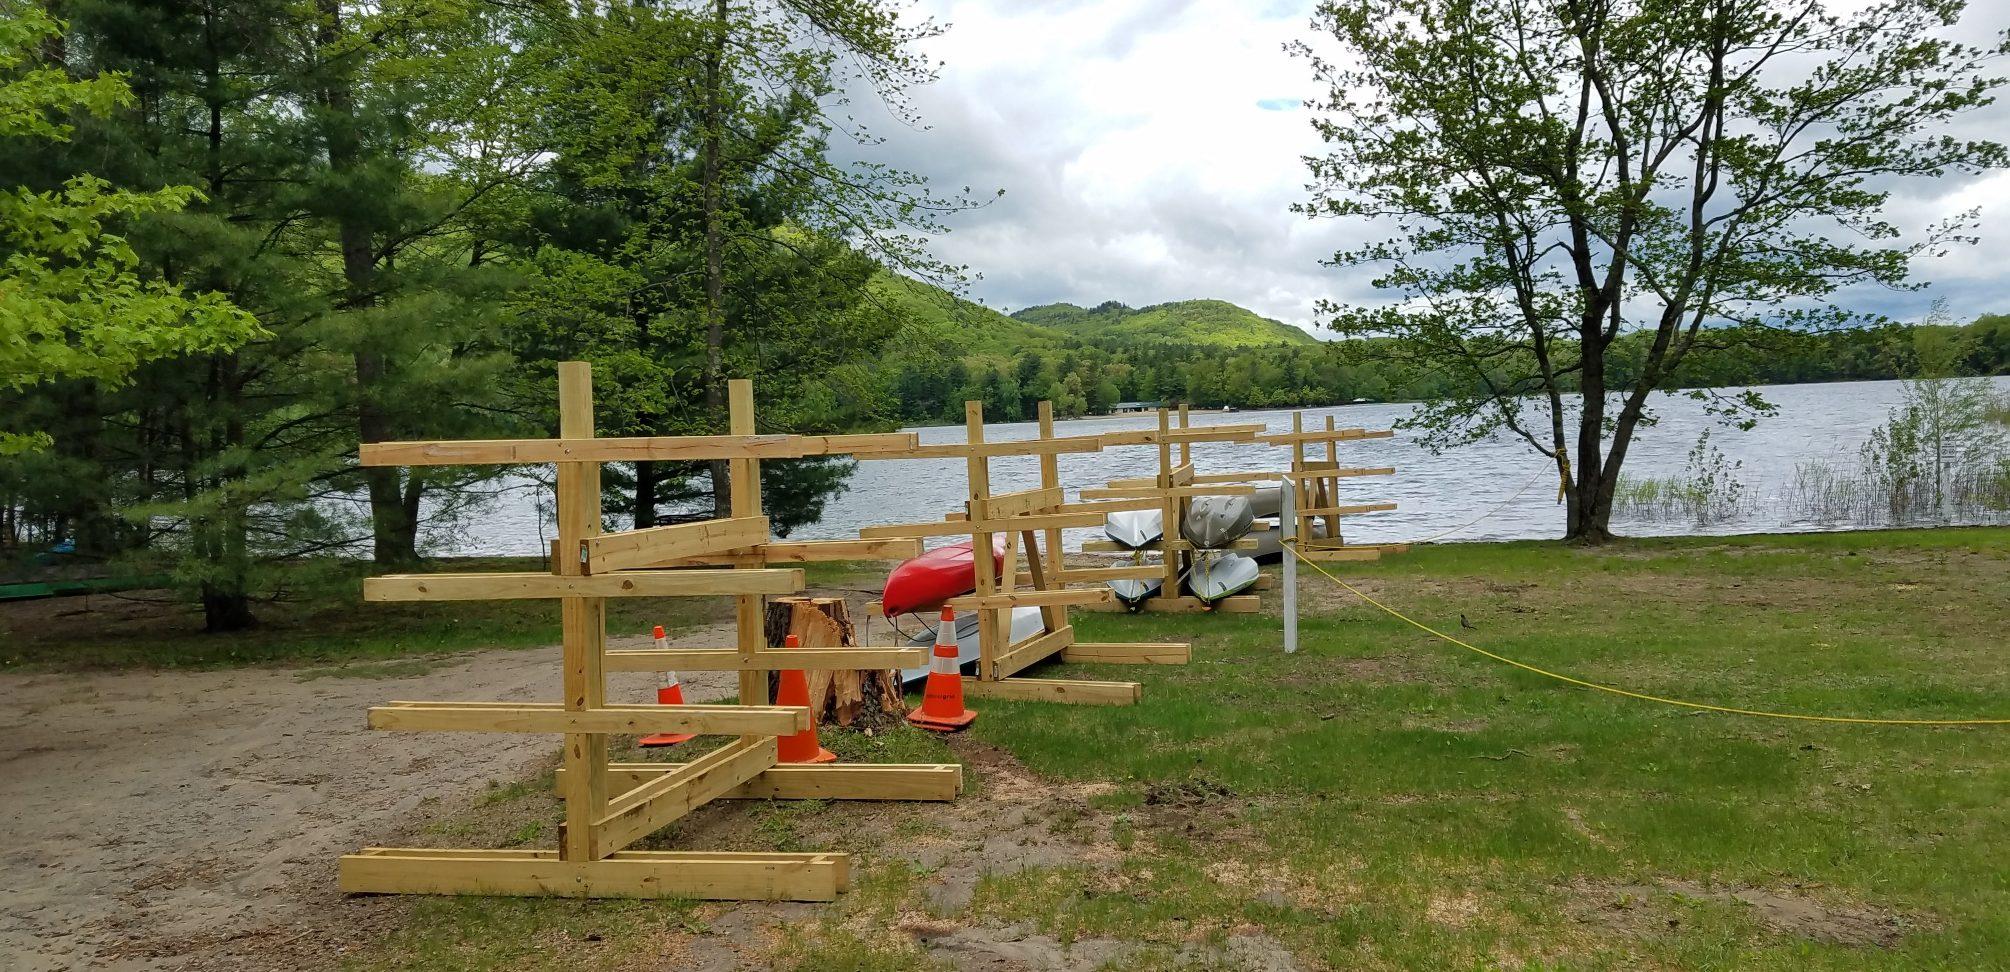 Kayak Racks Ready to Go